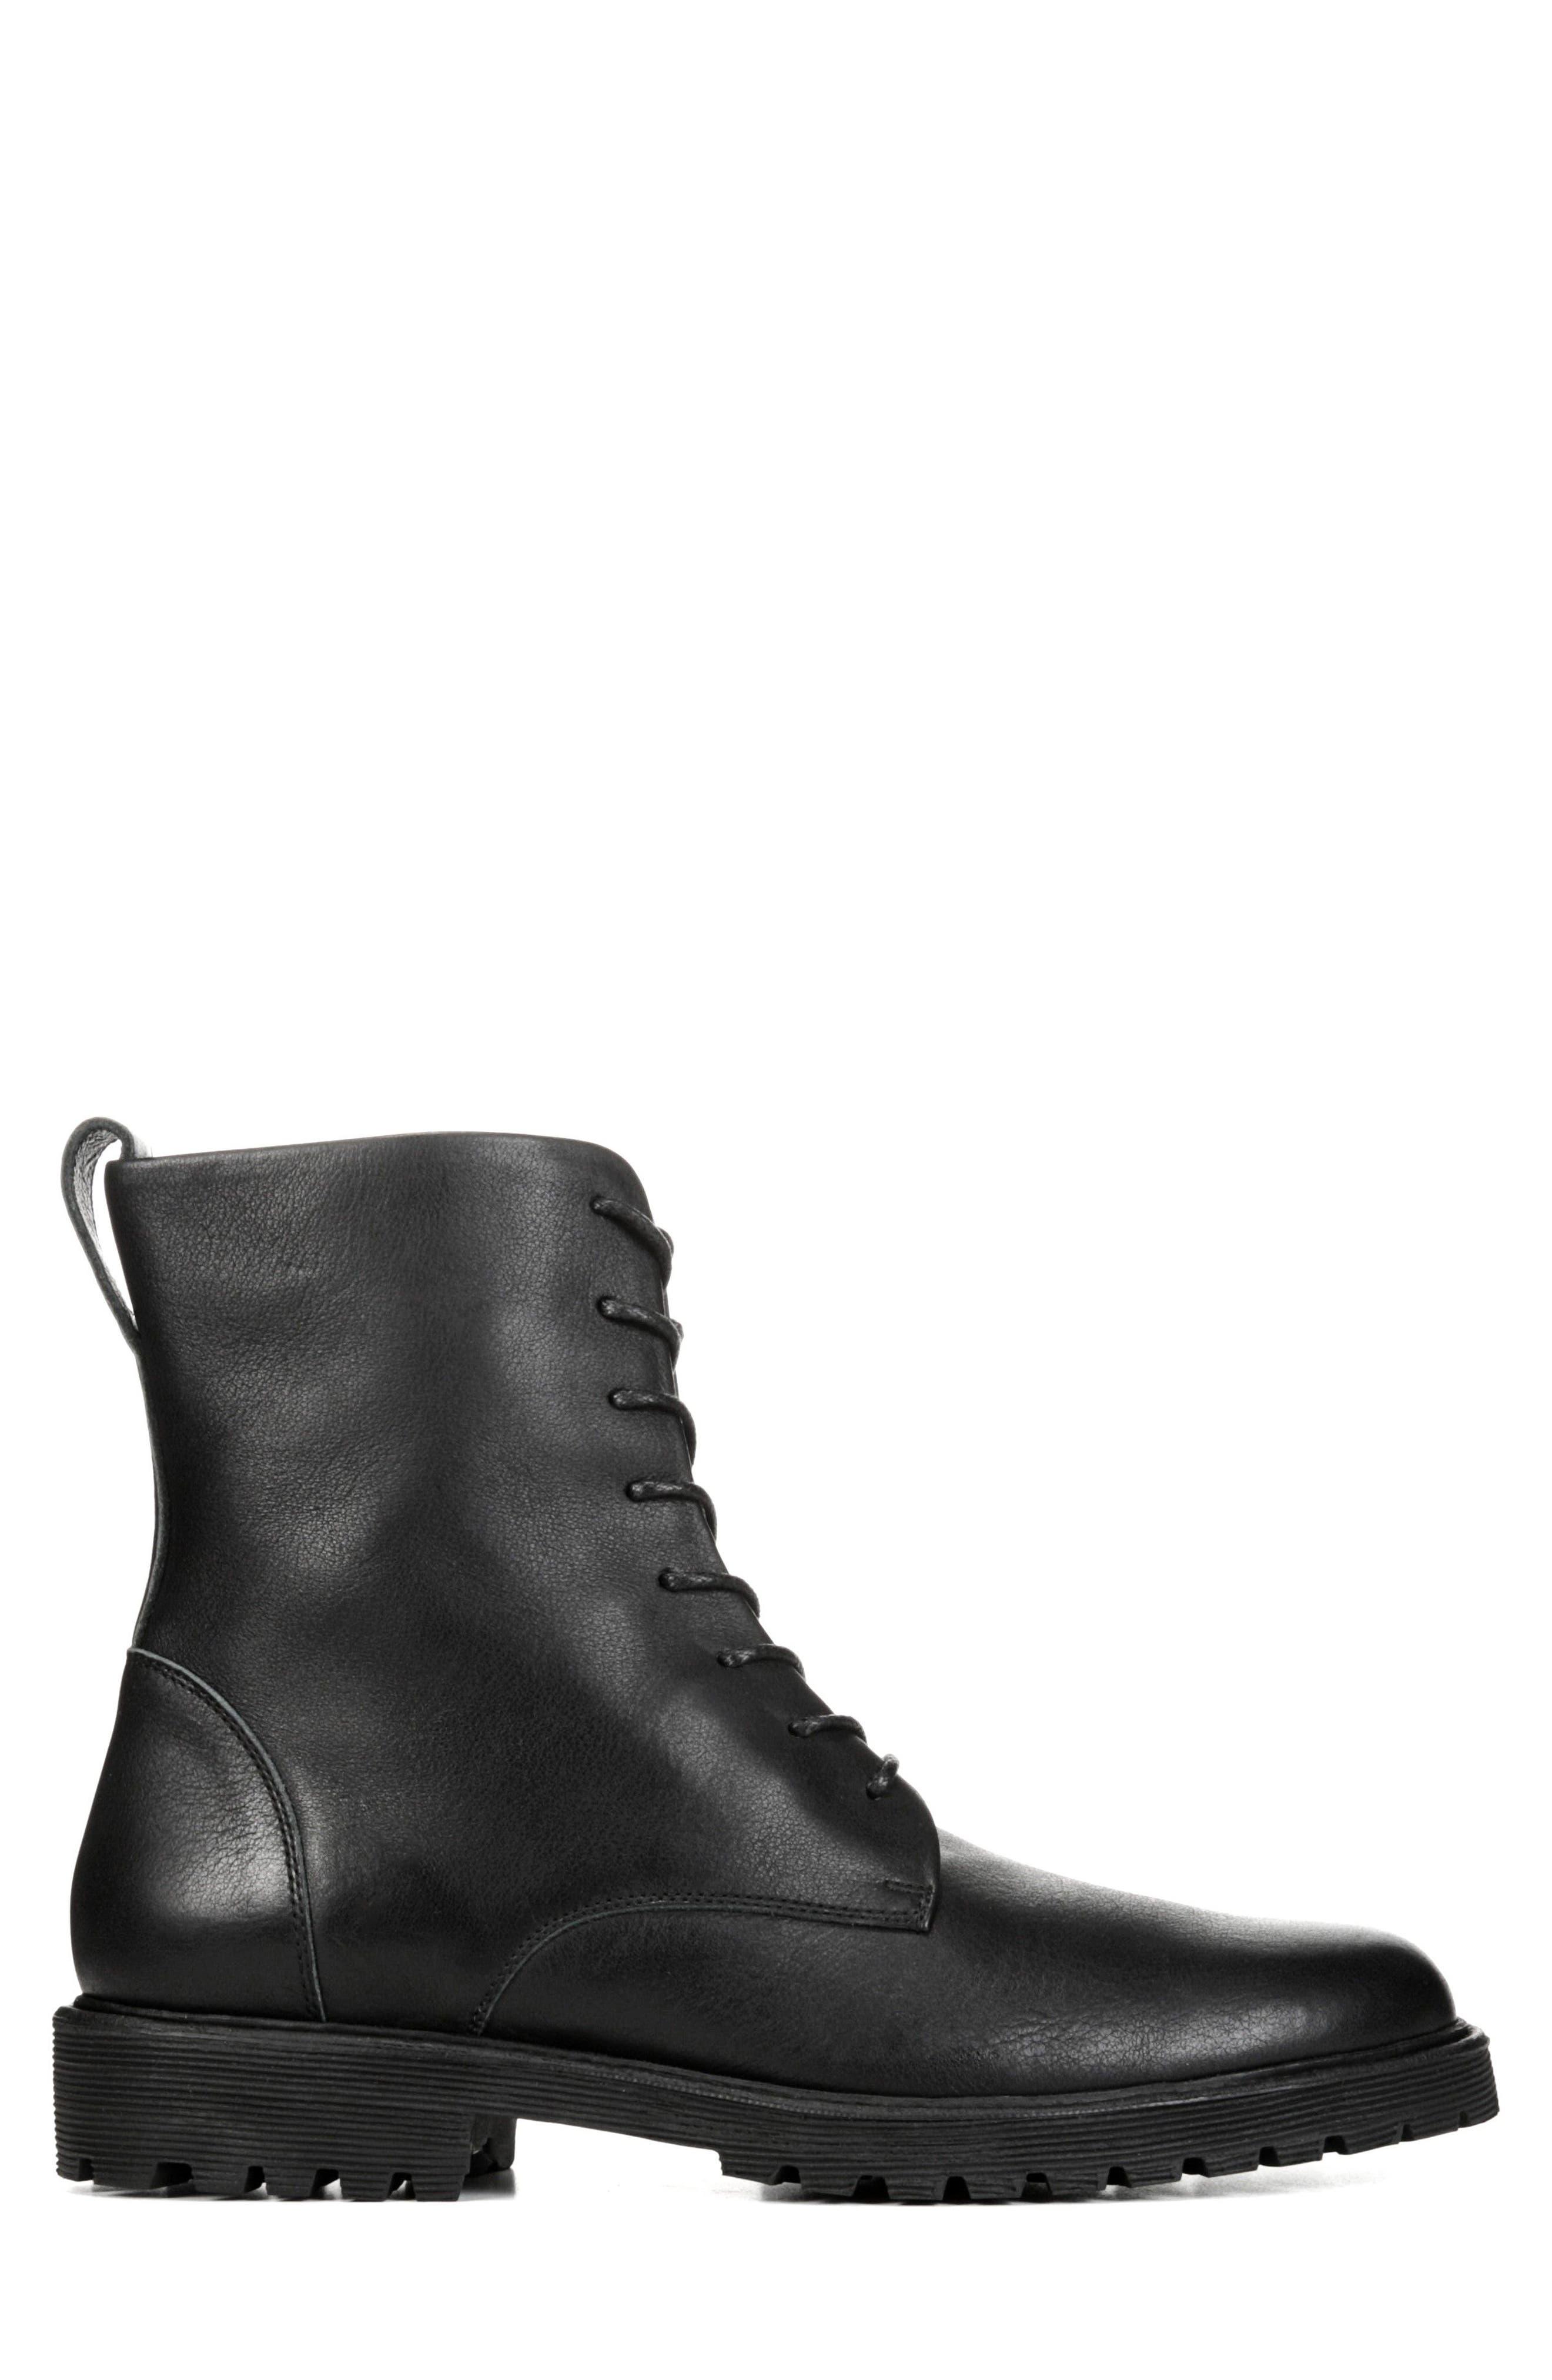 Brigade Plain Toe Boot,                             Alternate thumbnail 3, color,                             001